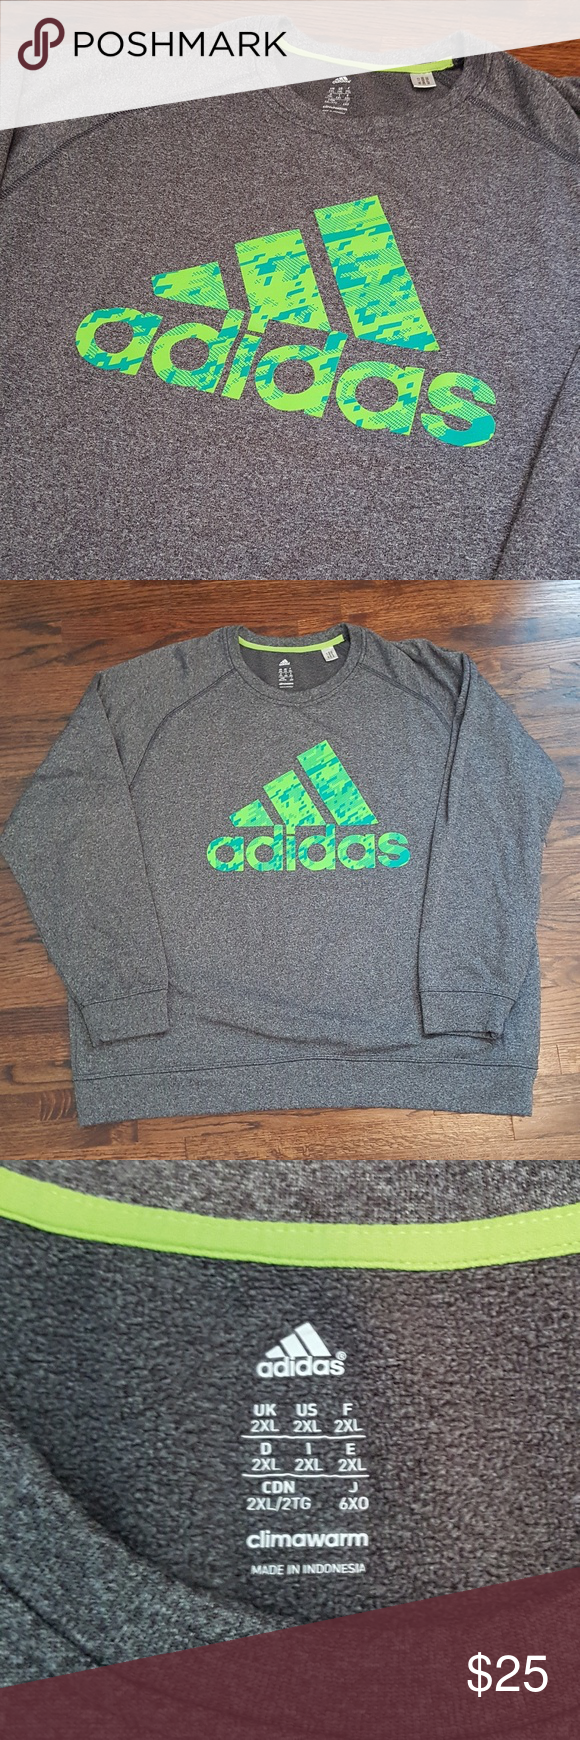 Predownload: Adidas Climawarm Grey Crew Neck Sweatshirt 2xl Green Logo Design Clothes Design Green Logo [ 1740 x 580 Pixel ]